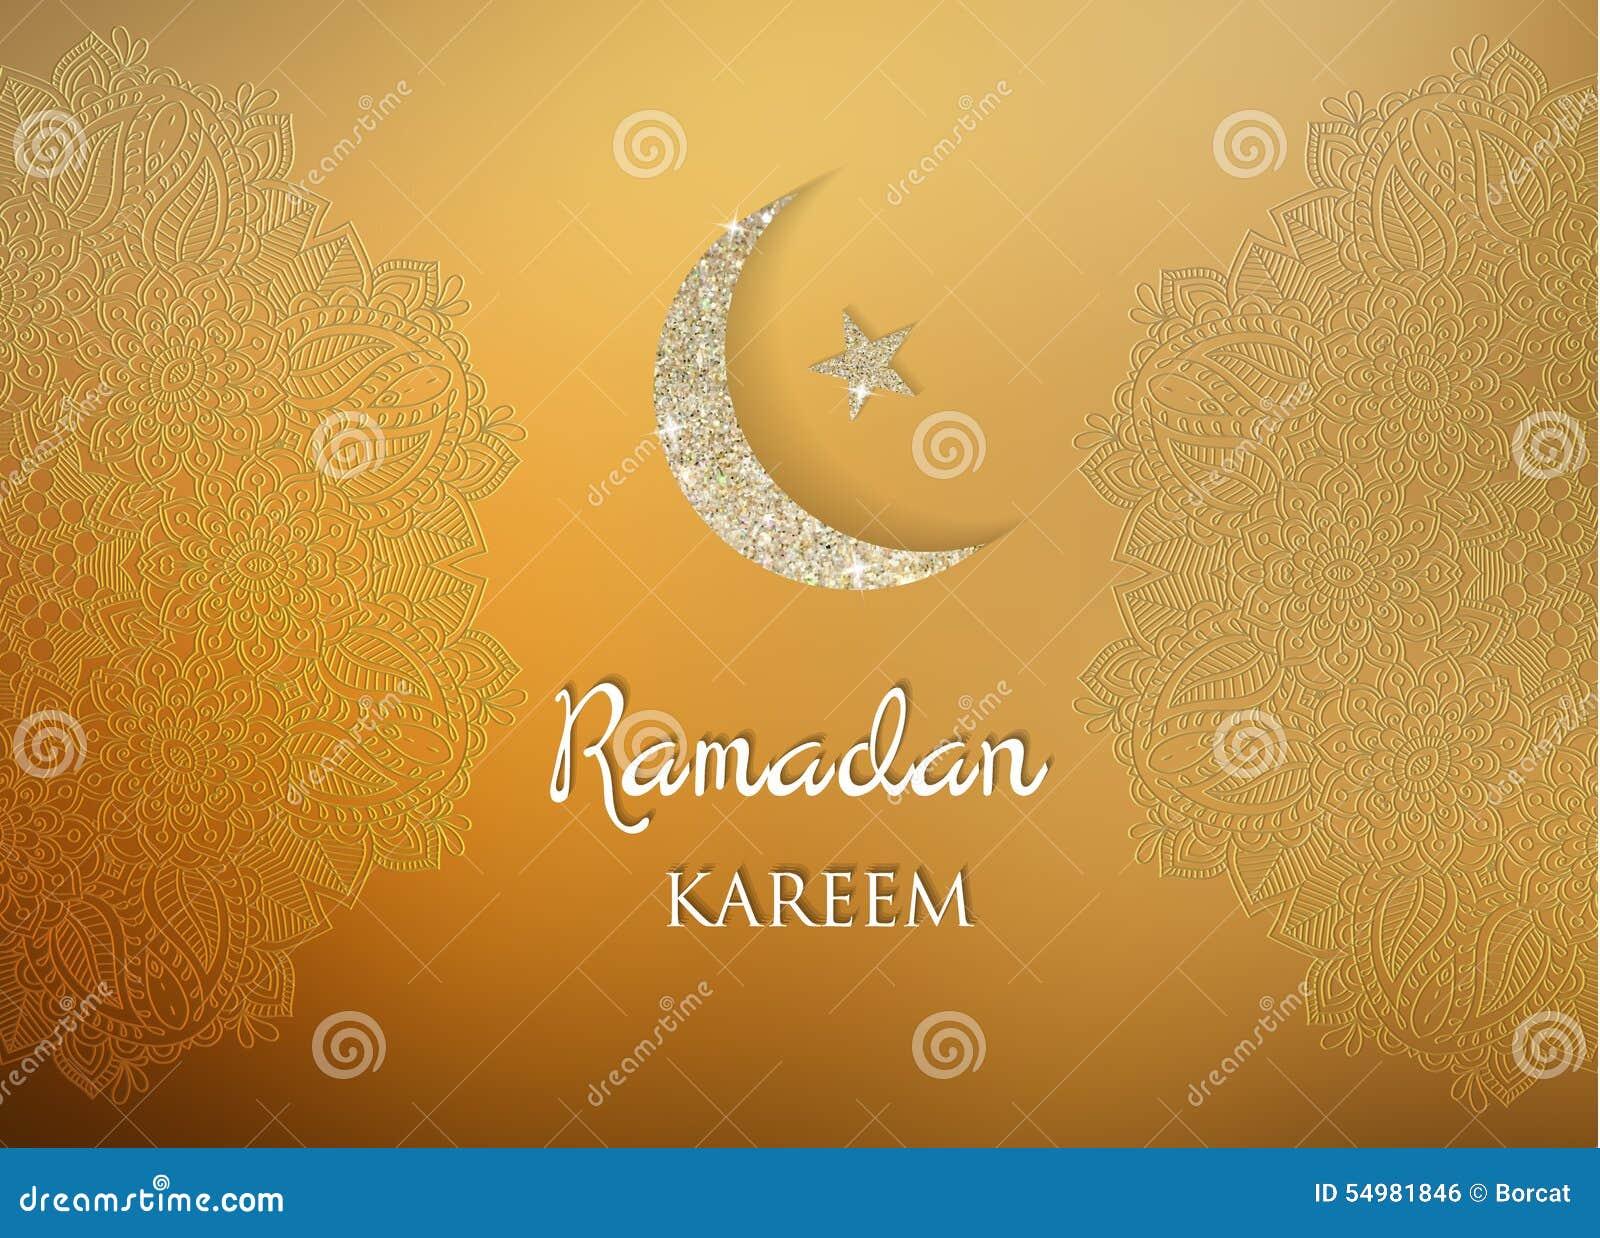 Ramadan greetings background ramadan kareem means ramadan the ramadan greetings background ramadan kareem means ramadan the generous month kristyandbryce Images